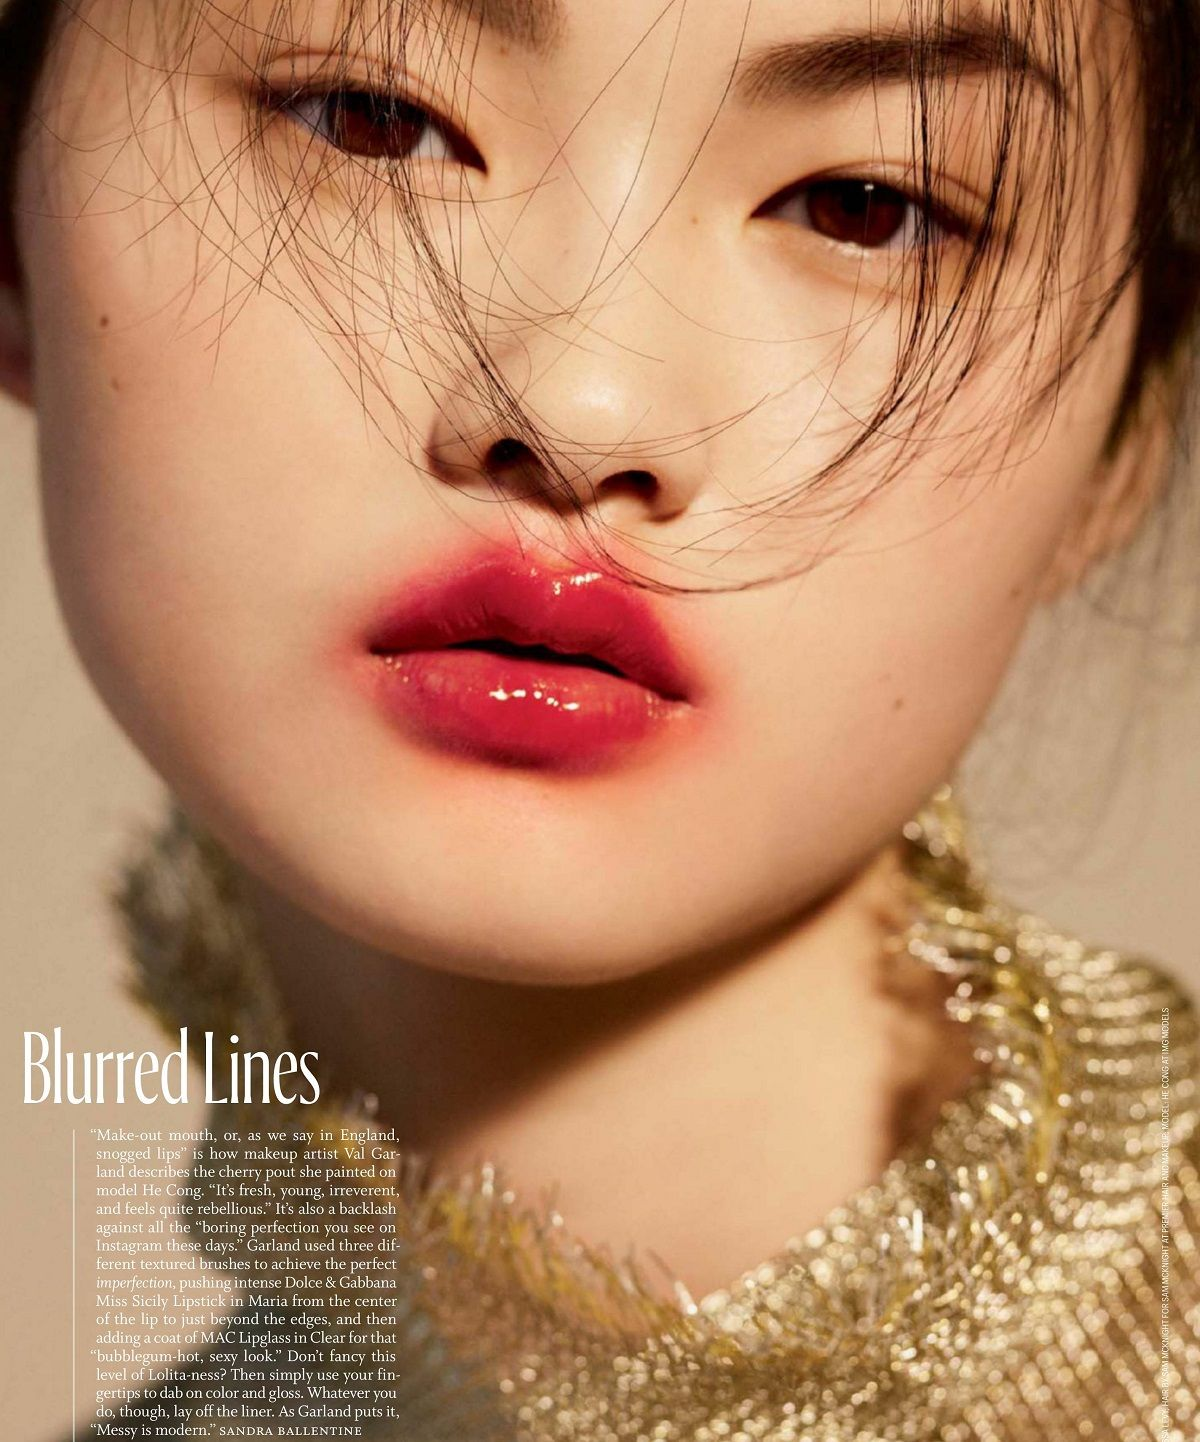 Model: Cong He (IMG)  Editorial: Blurred Lines  Magazine: W Magazine, May 2017  Photographer: Sharif Hamza  Stylist: Melissa Levy  Hair: Sam McKnight  Makeup: Val Garland